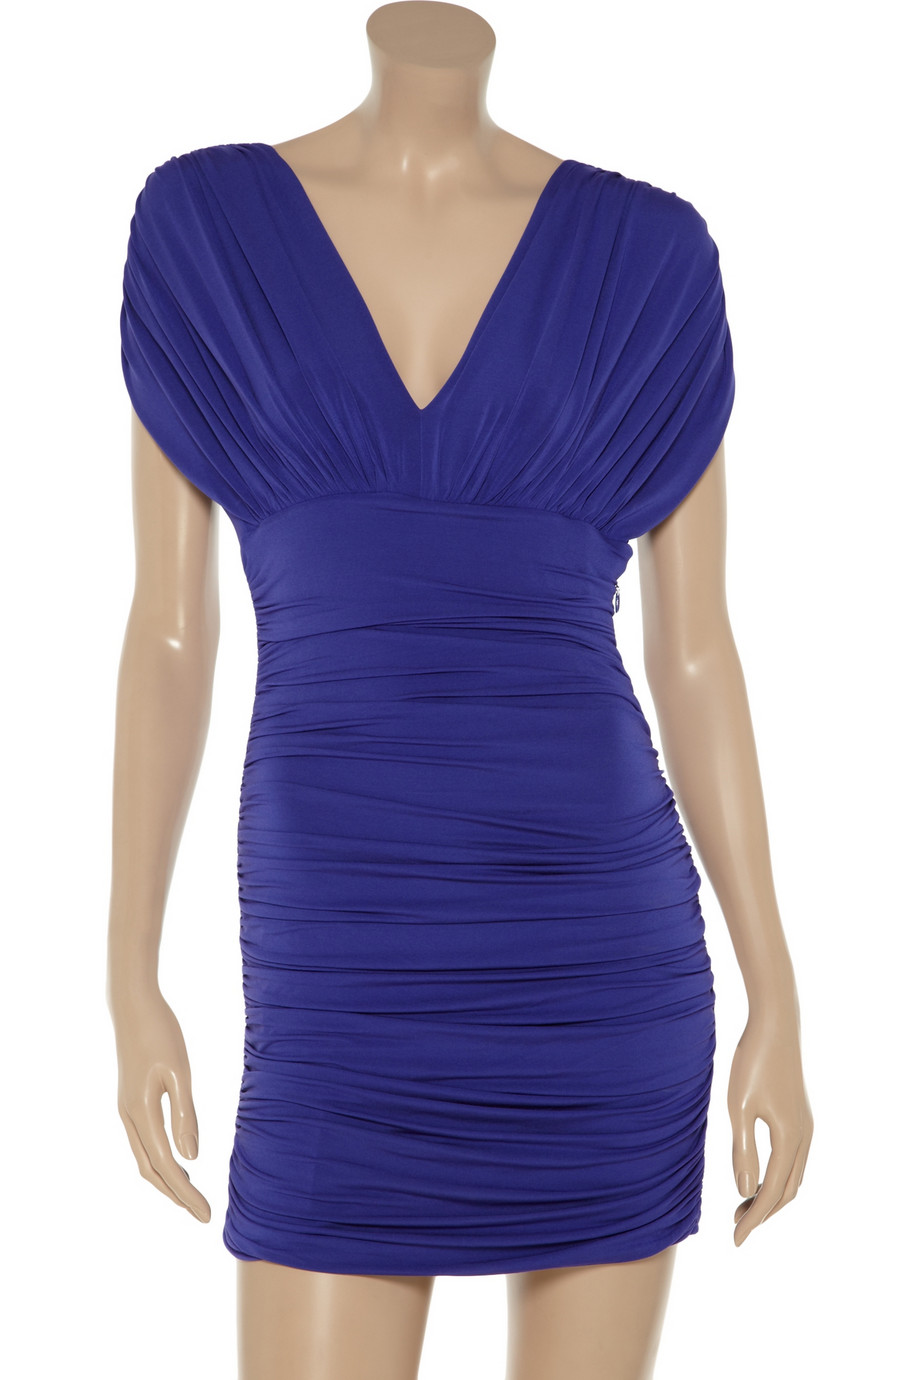 Wedding Ruched bcbgmaxazria nevis ruched jersey dress in blue lyst gallery